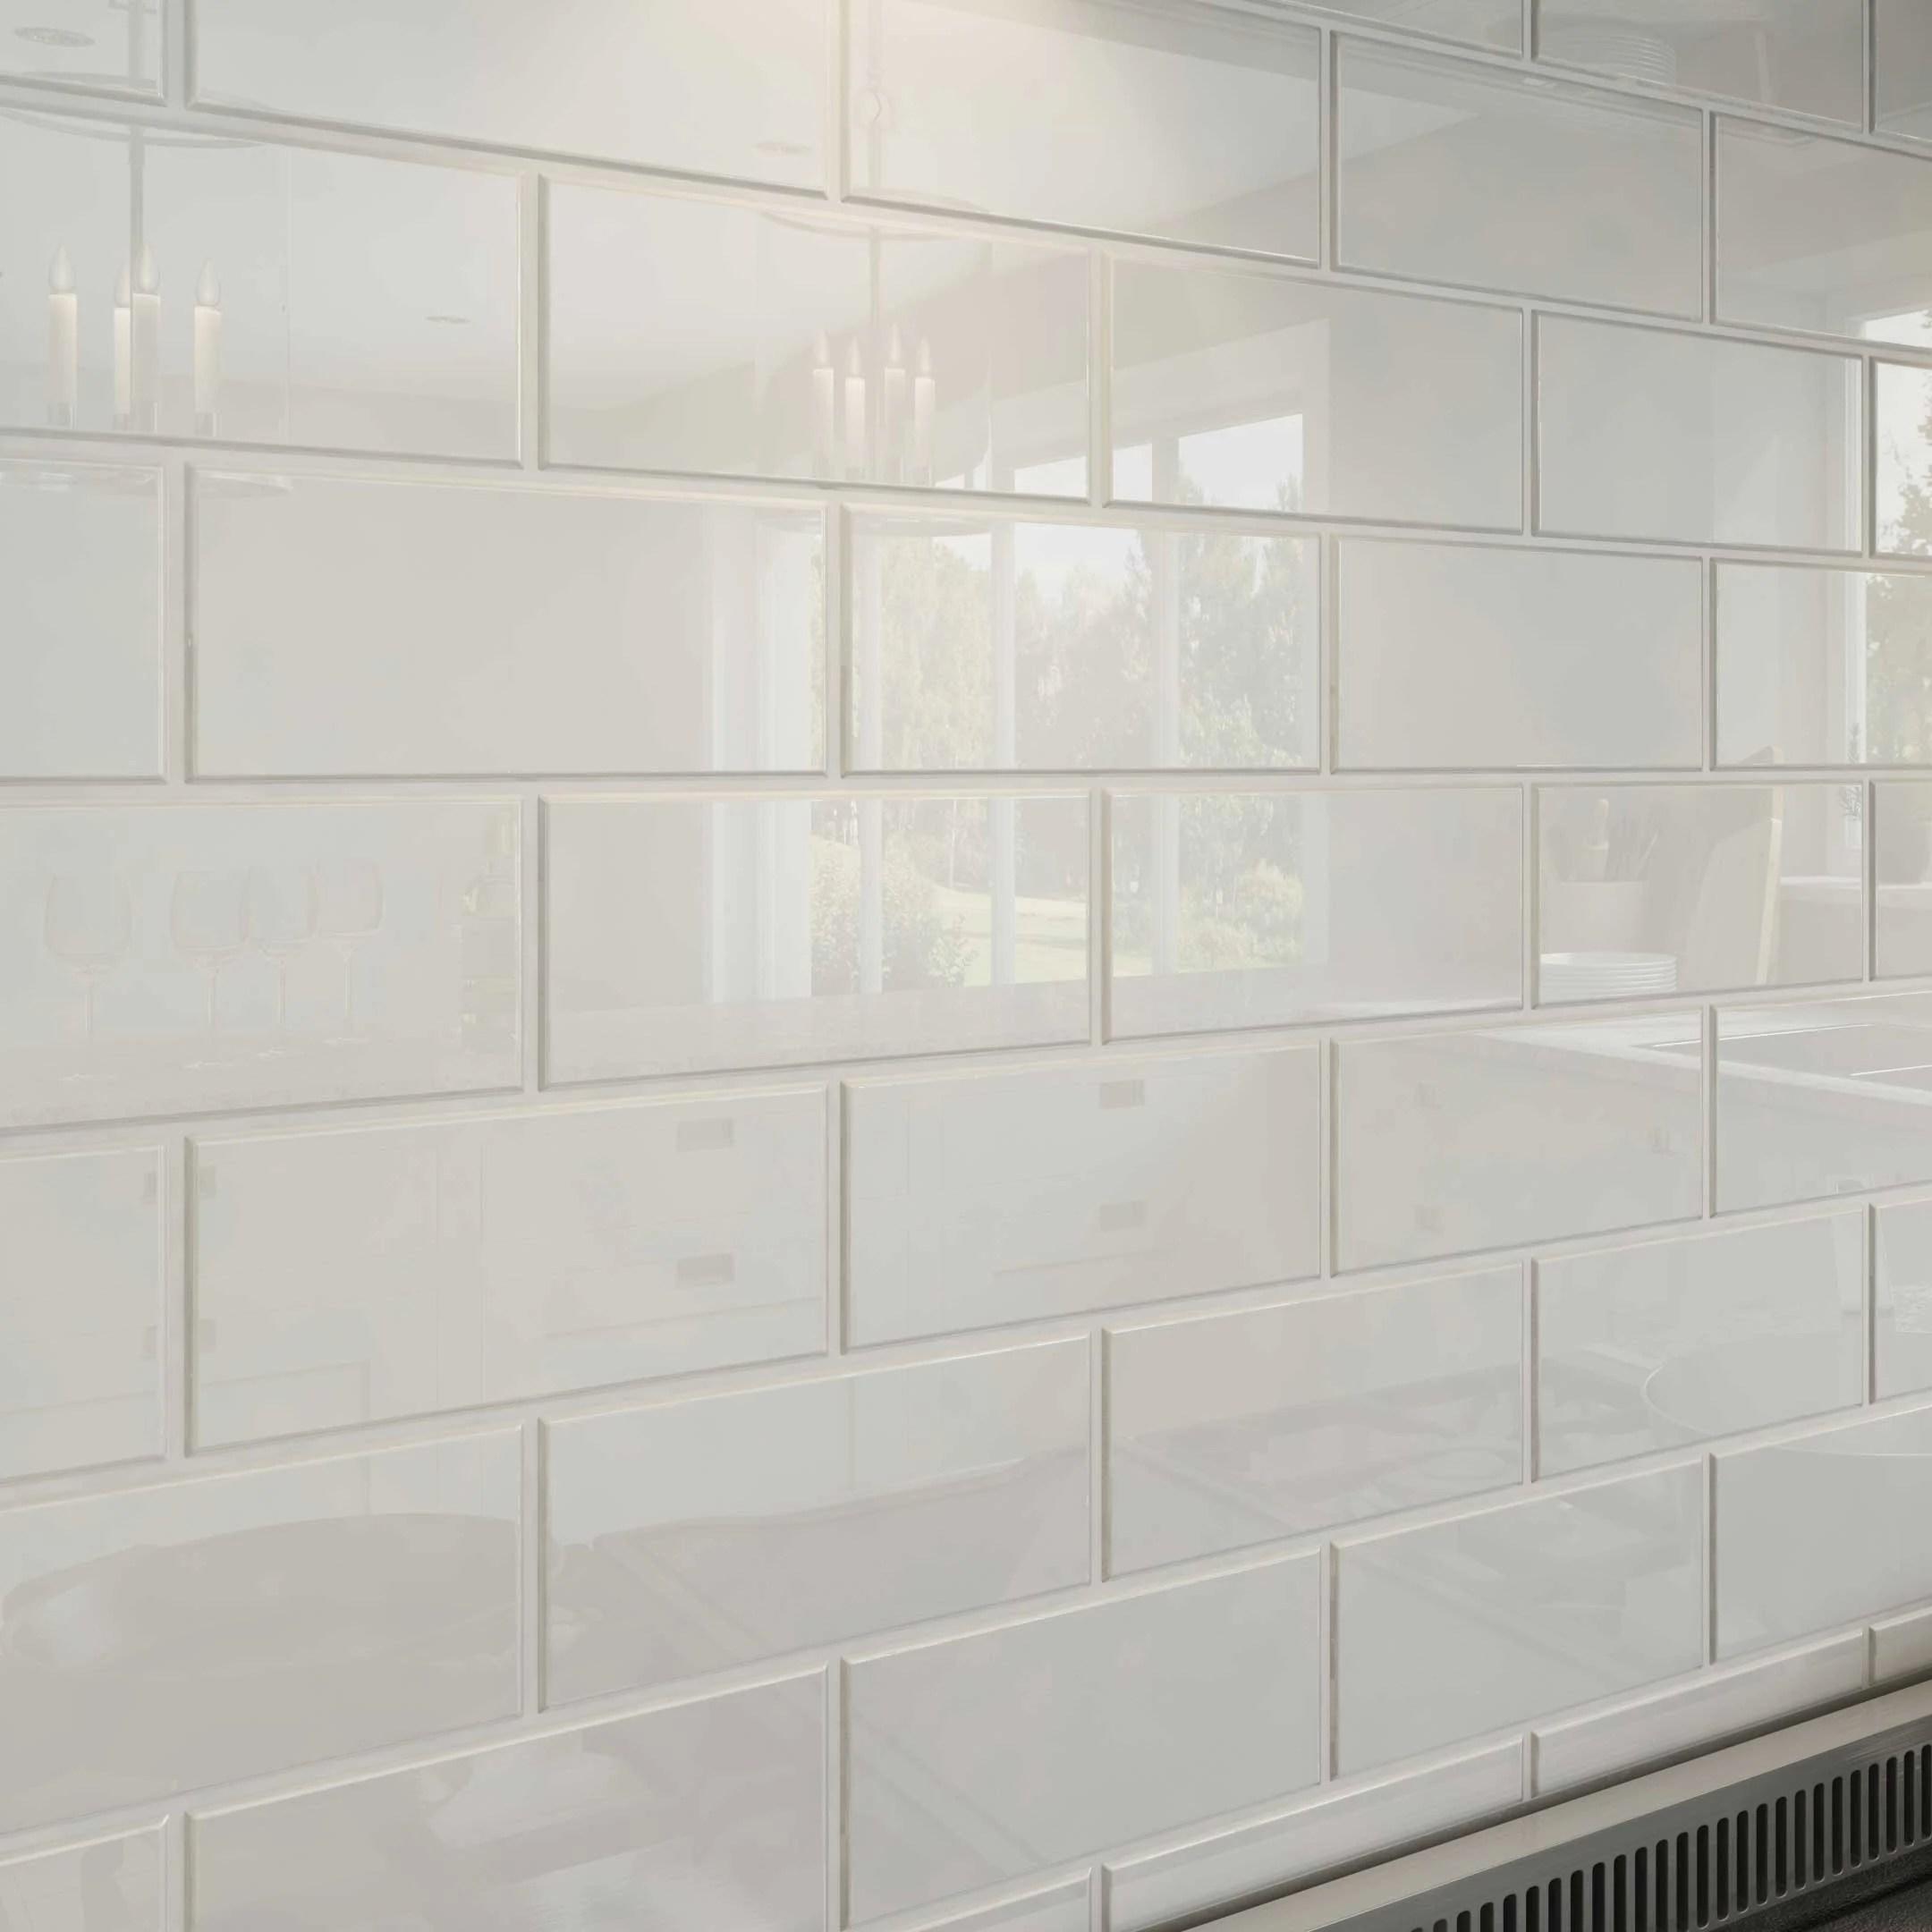 bright white 3x6 glass subway tiles